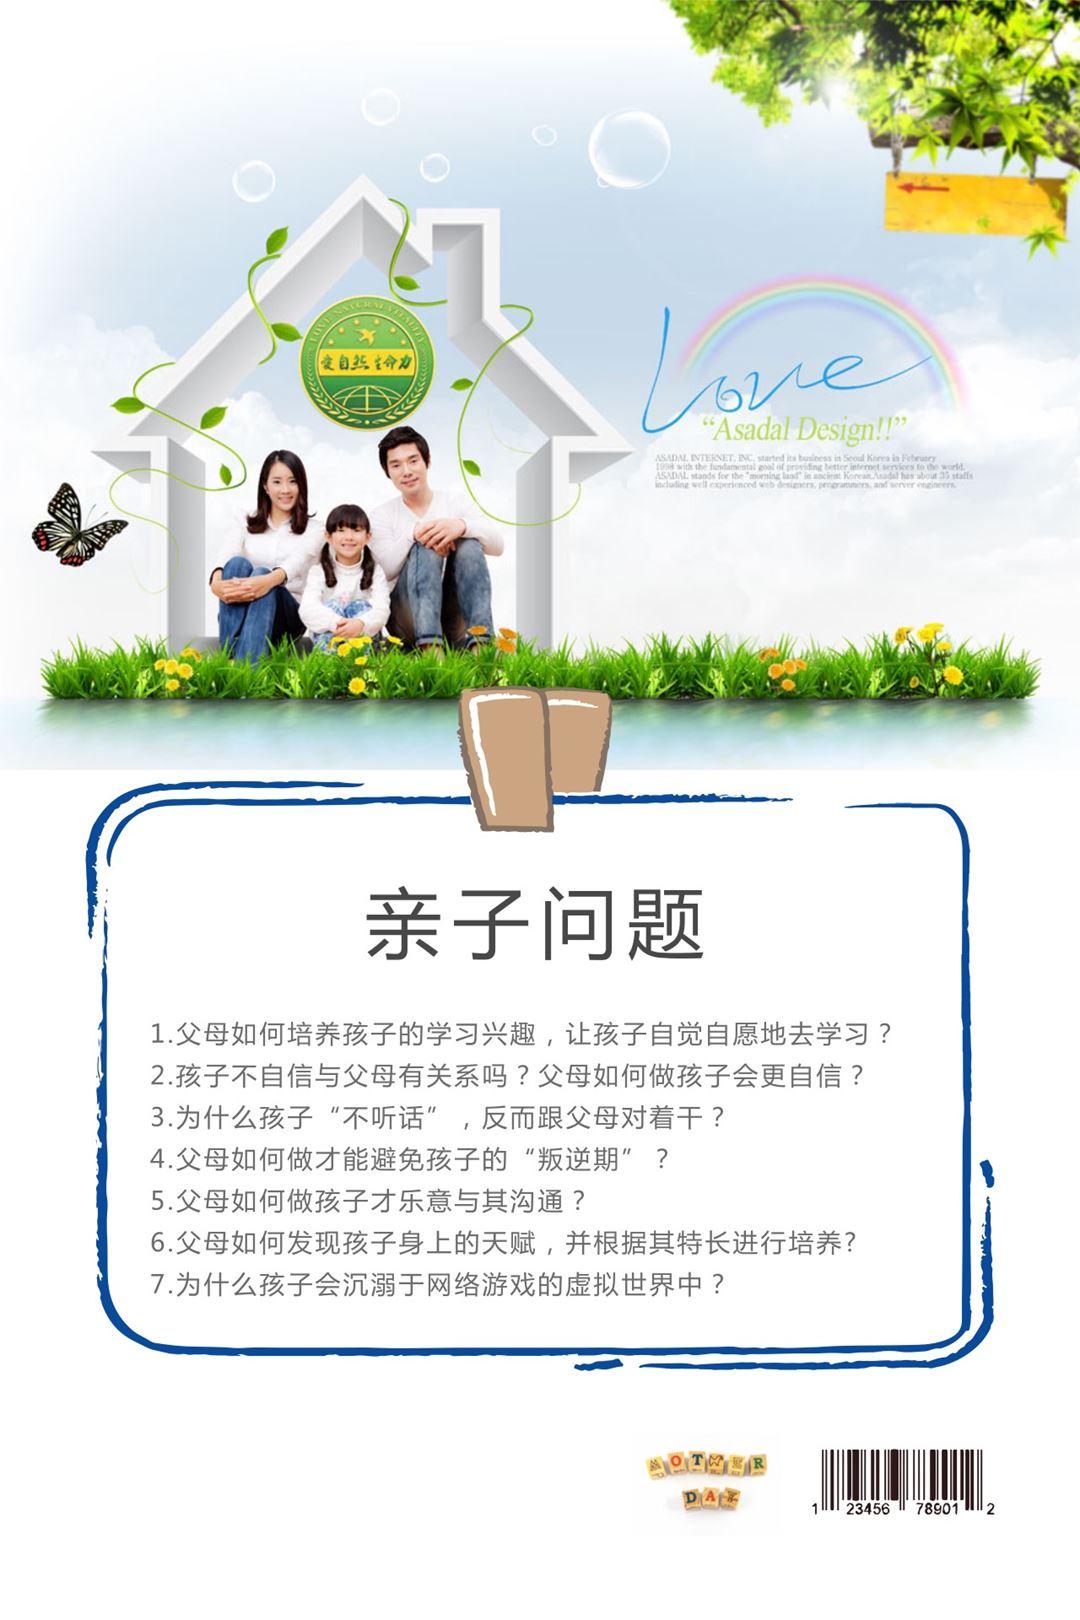 http://www.huodongxing.com/file/20180515/1003056949915/644176693930714.jpg